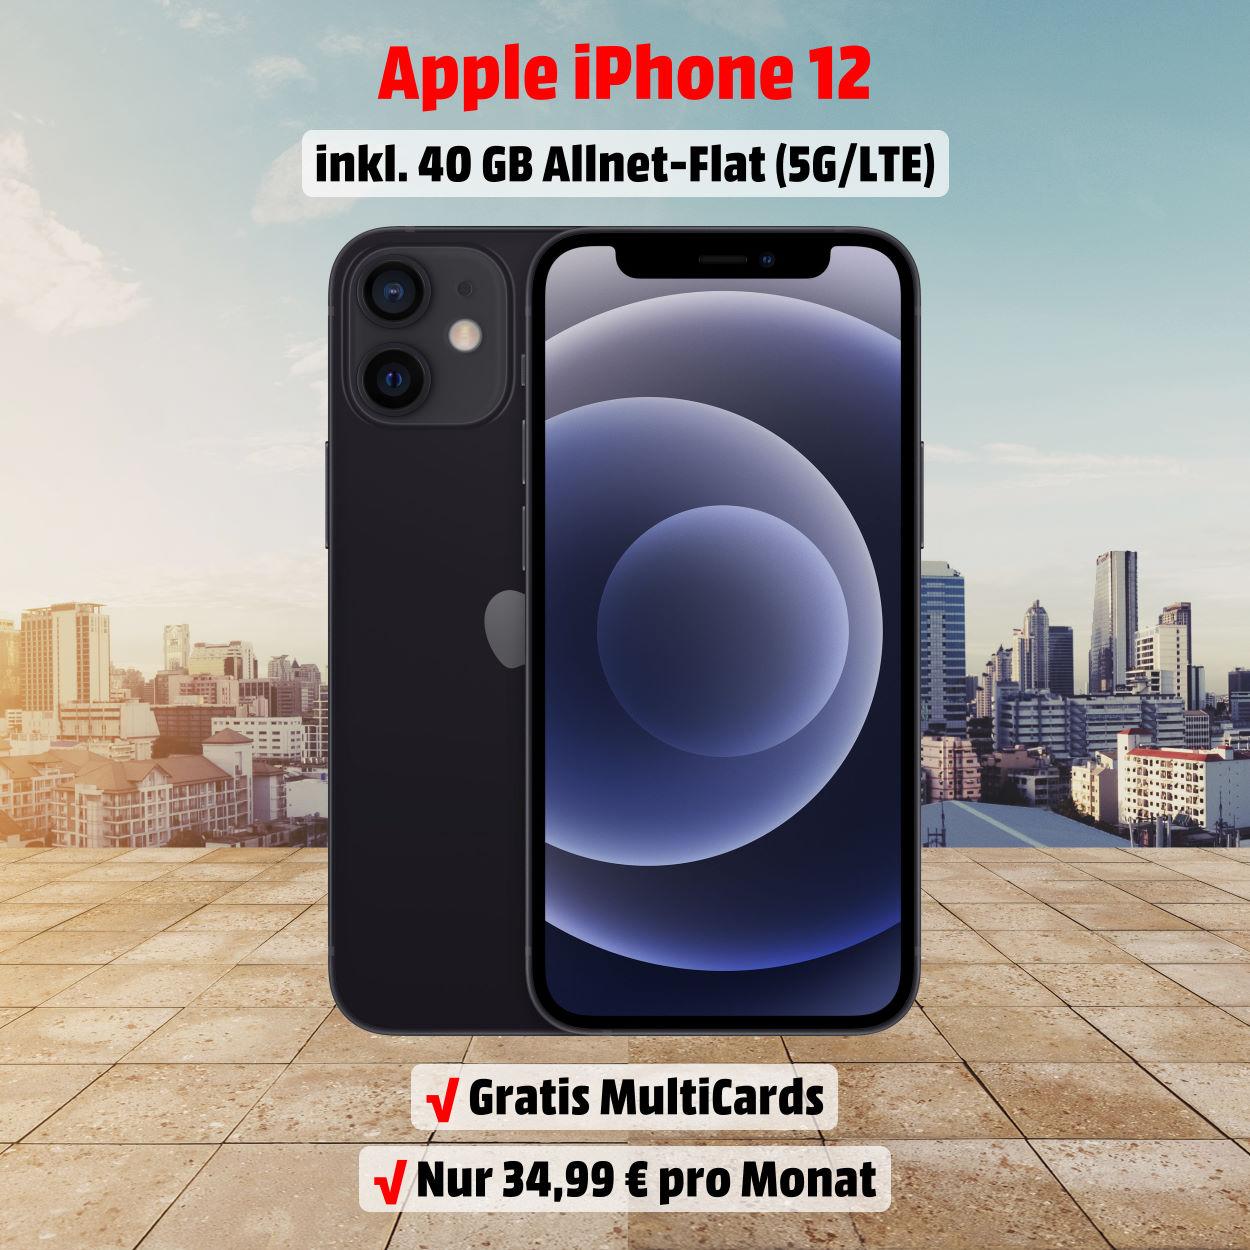 iPhone 12 inkl. 40 GB 5G-LTE Allnet-Flat zum absoluten Bestpreis